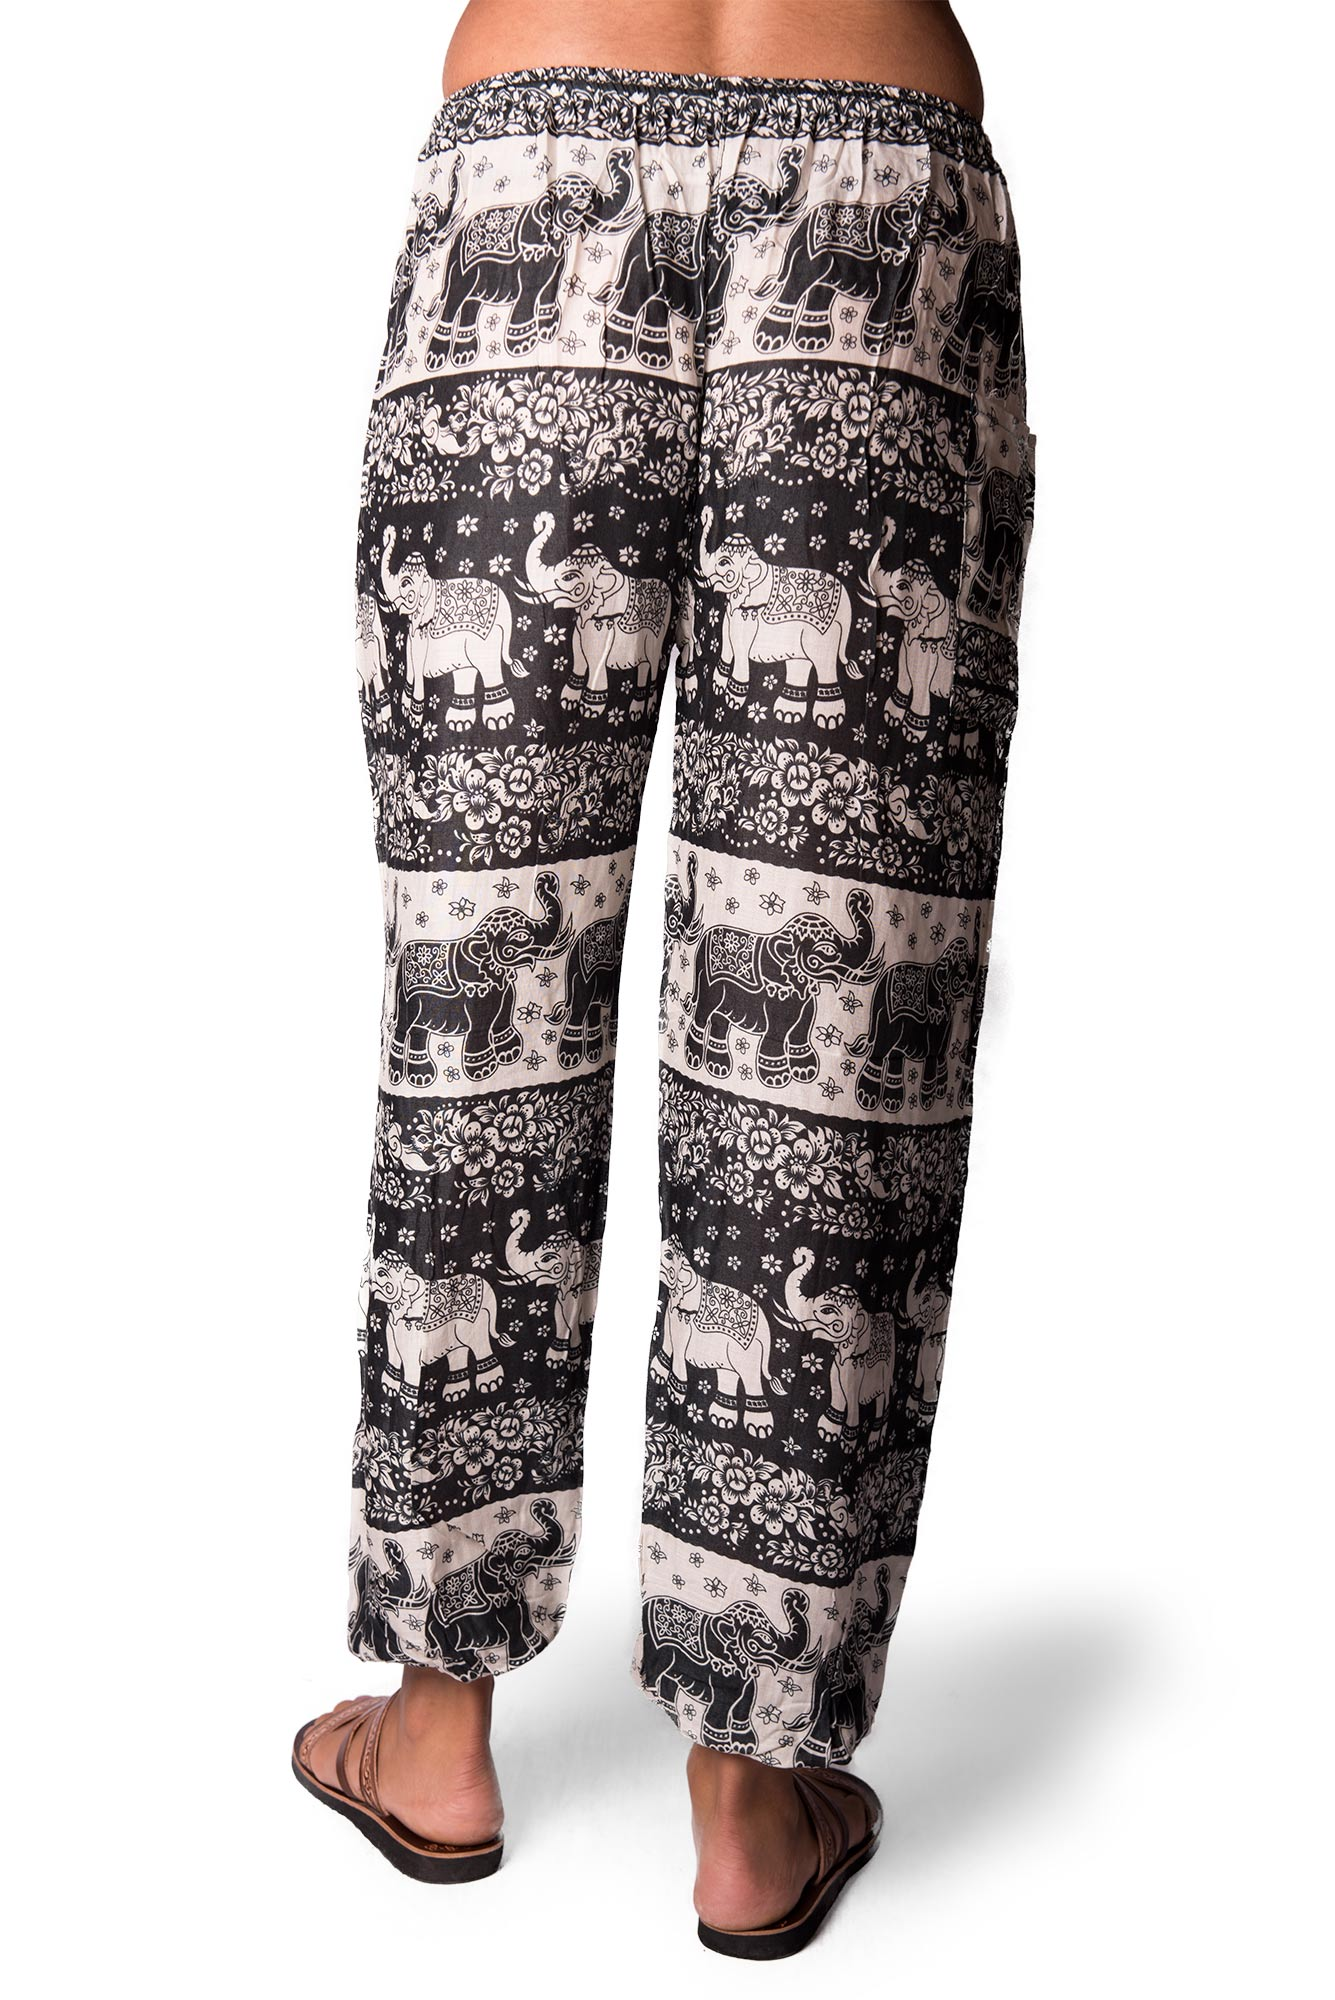 Drawstring Pants Elephant Print, Black - 4495K